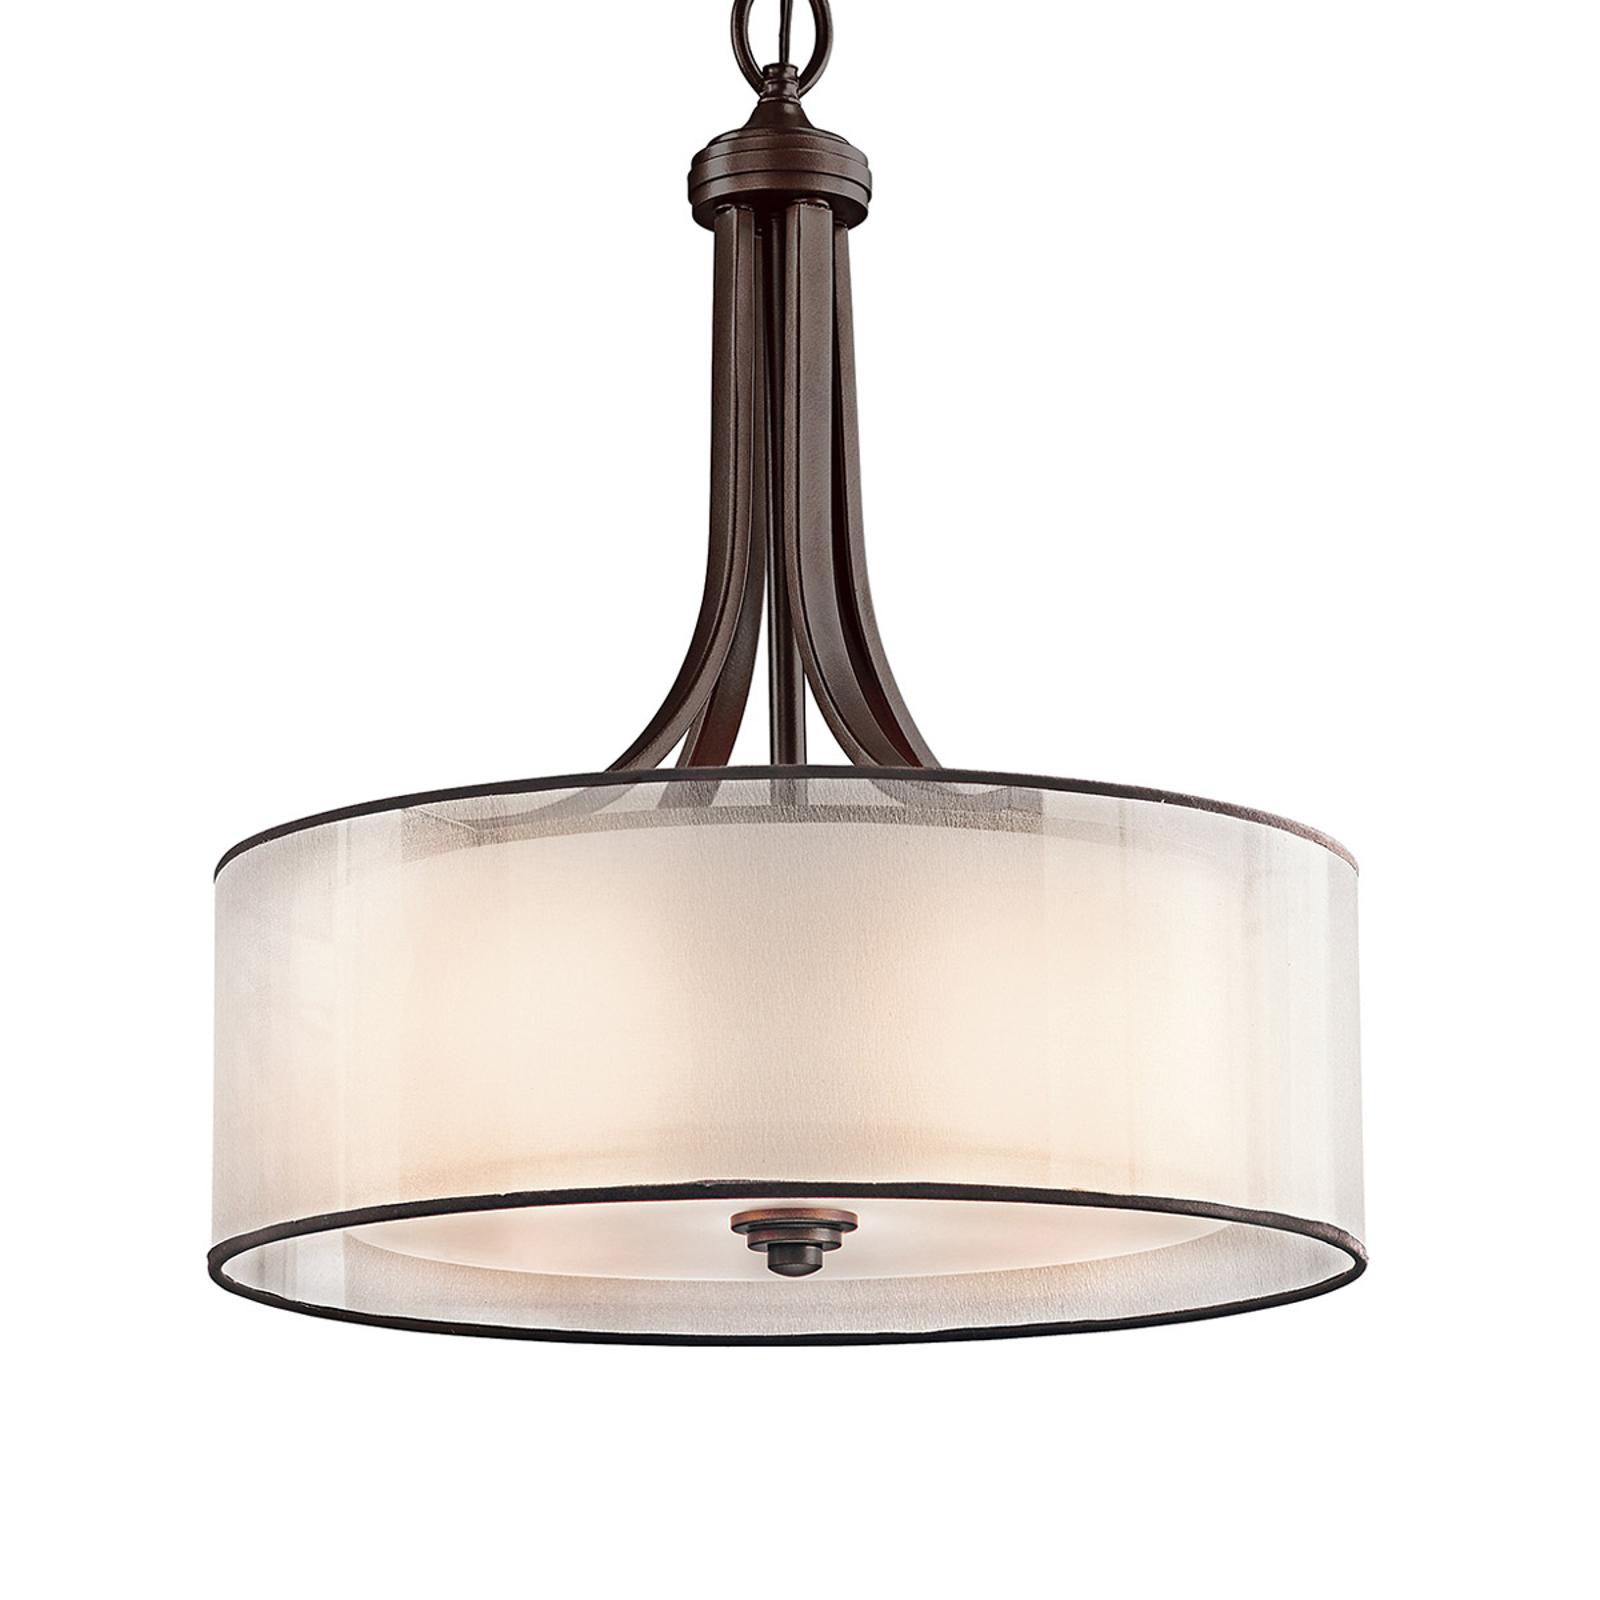 Hanglamp Lacey met dubbele kap